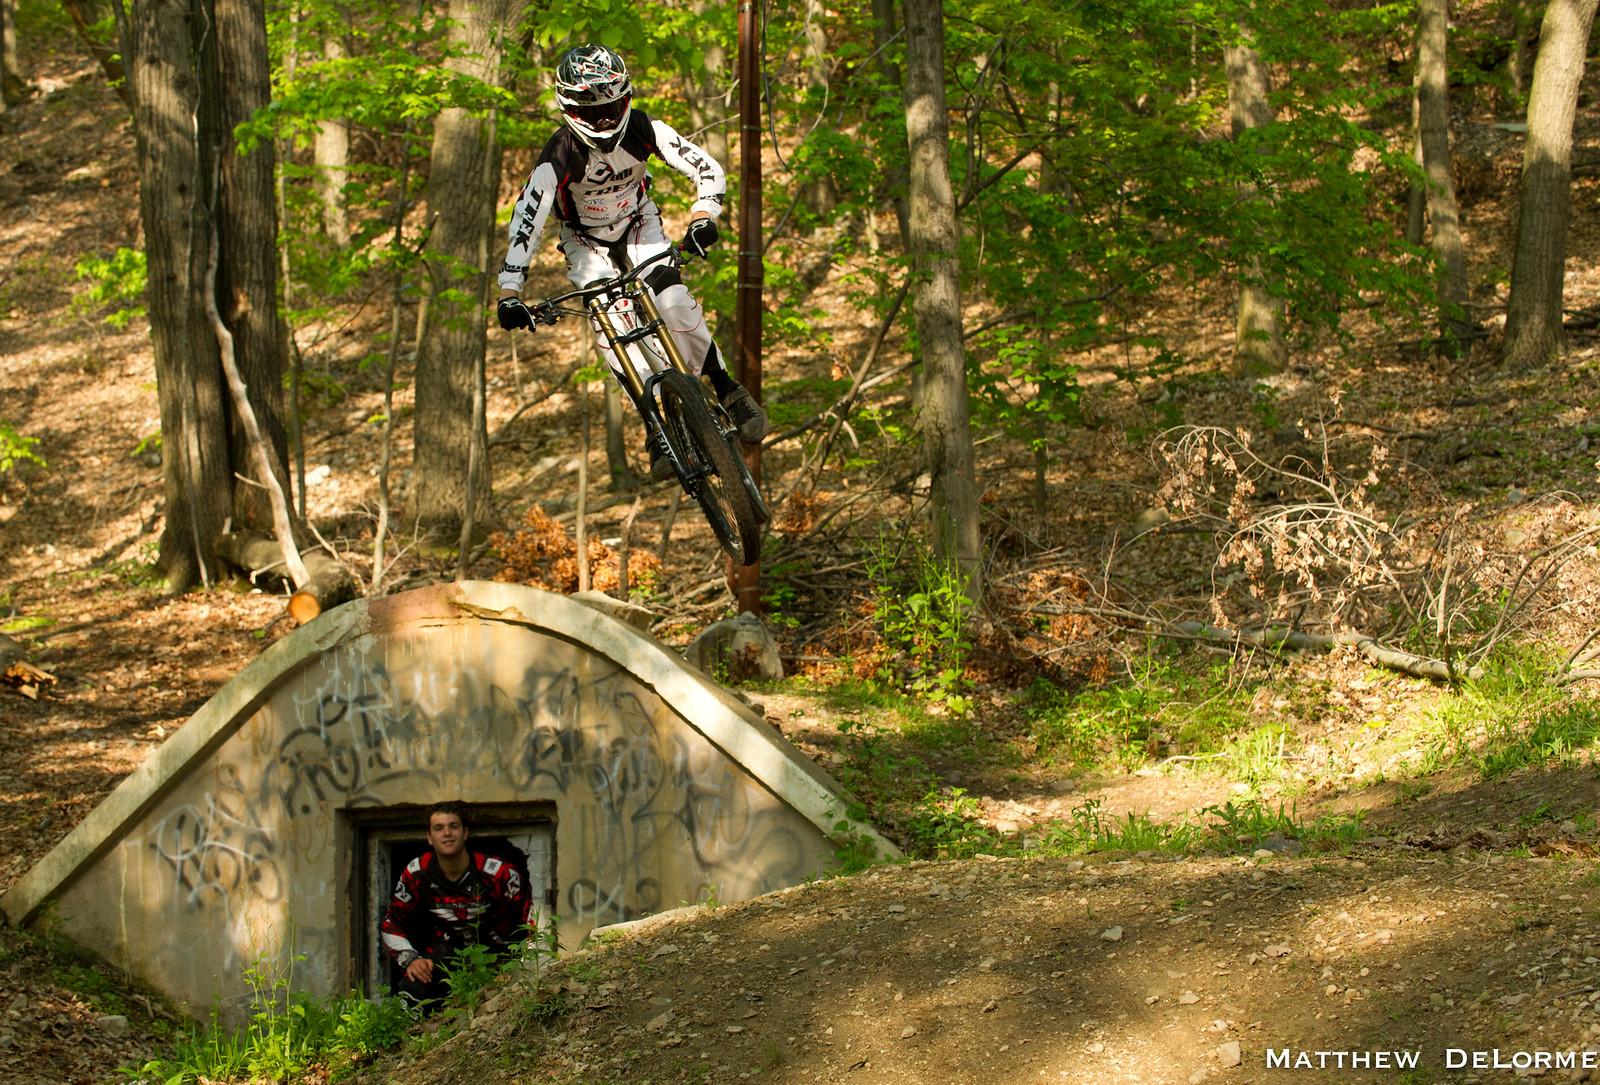 Bunker Jump - mdelorme - Mountain Biking Pictures - Vital MTB